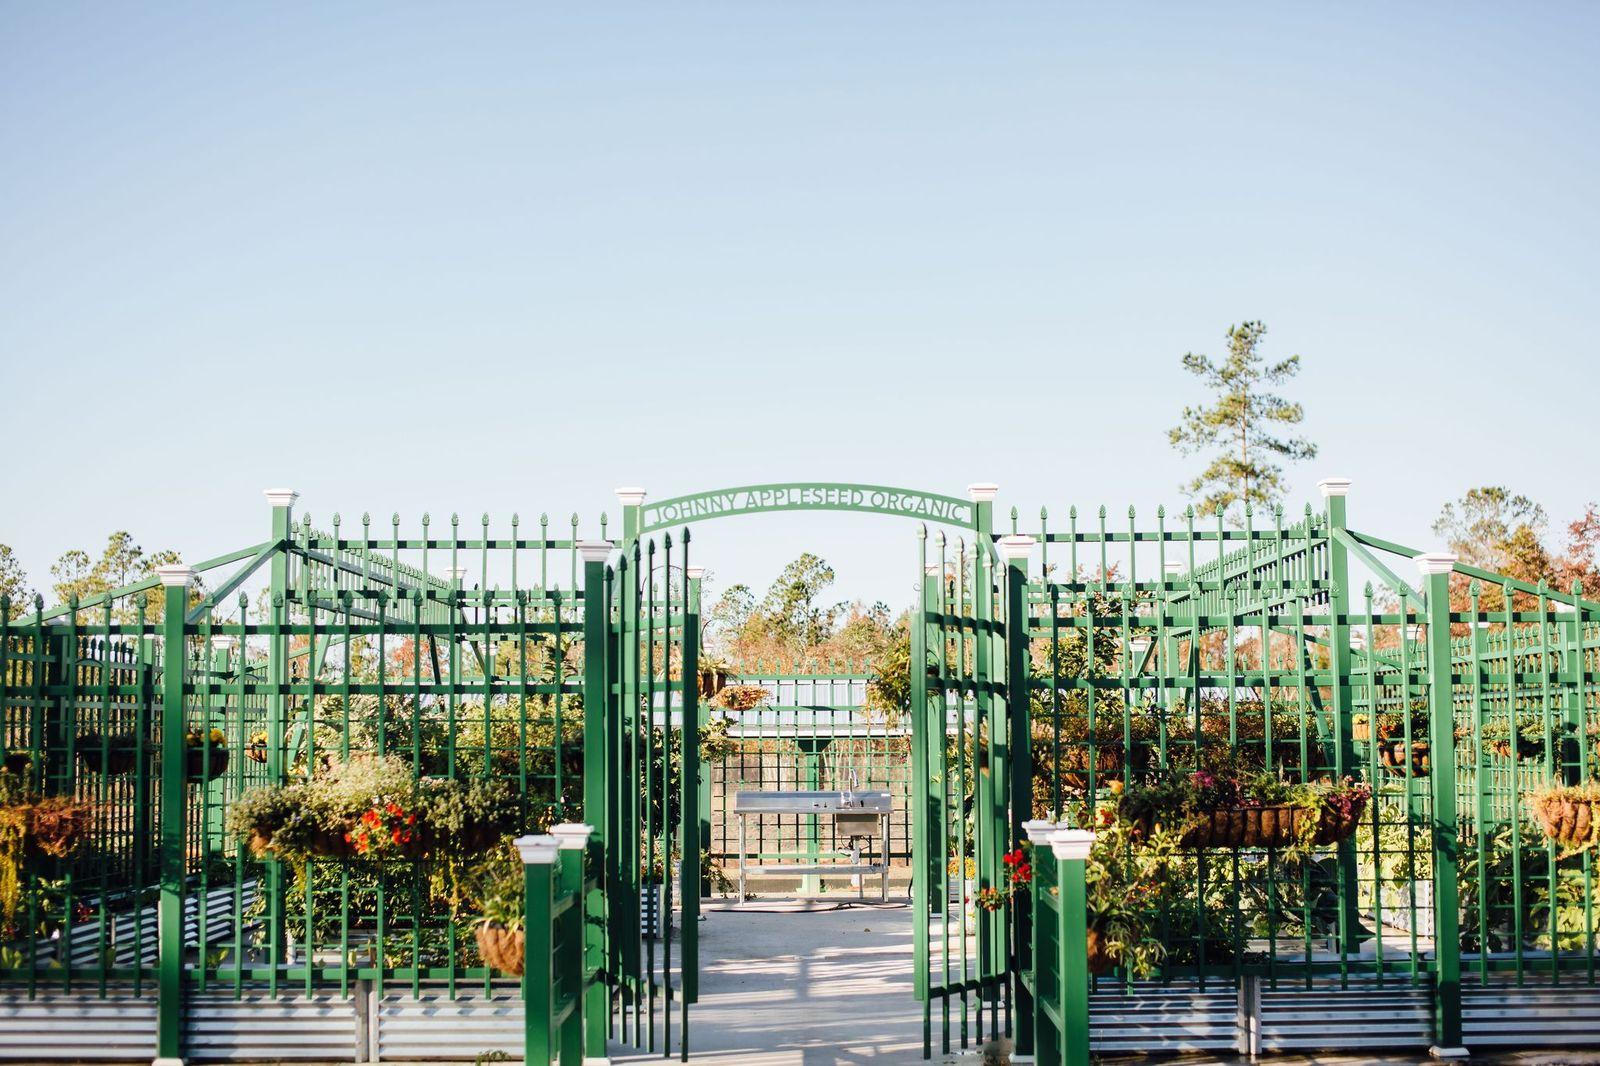 Johnny Appleseed Organic Farm